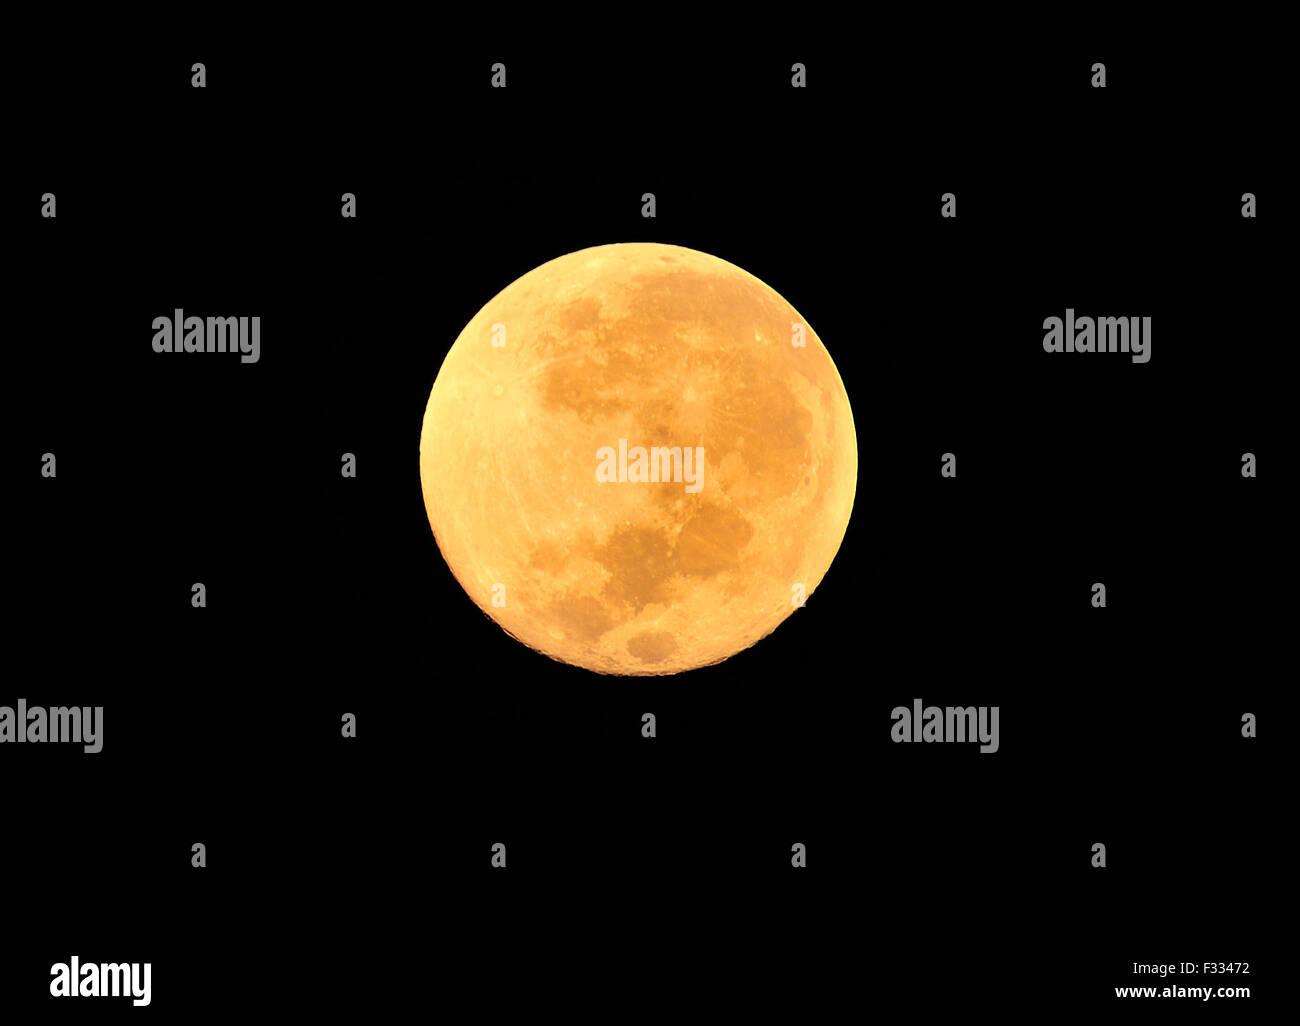 92d7fd19fbdd5 Super Moon Cebu City Philippines Stock Photo  87964998 - Alamy